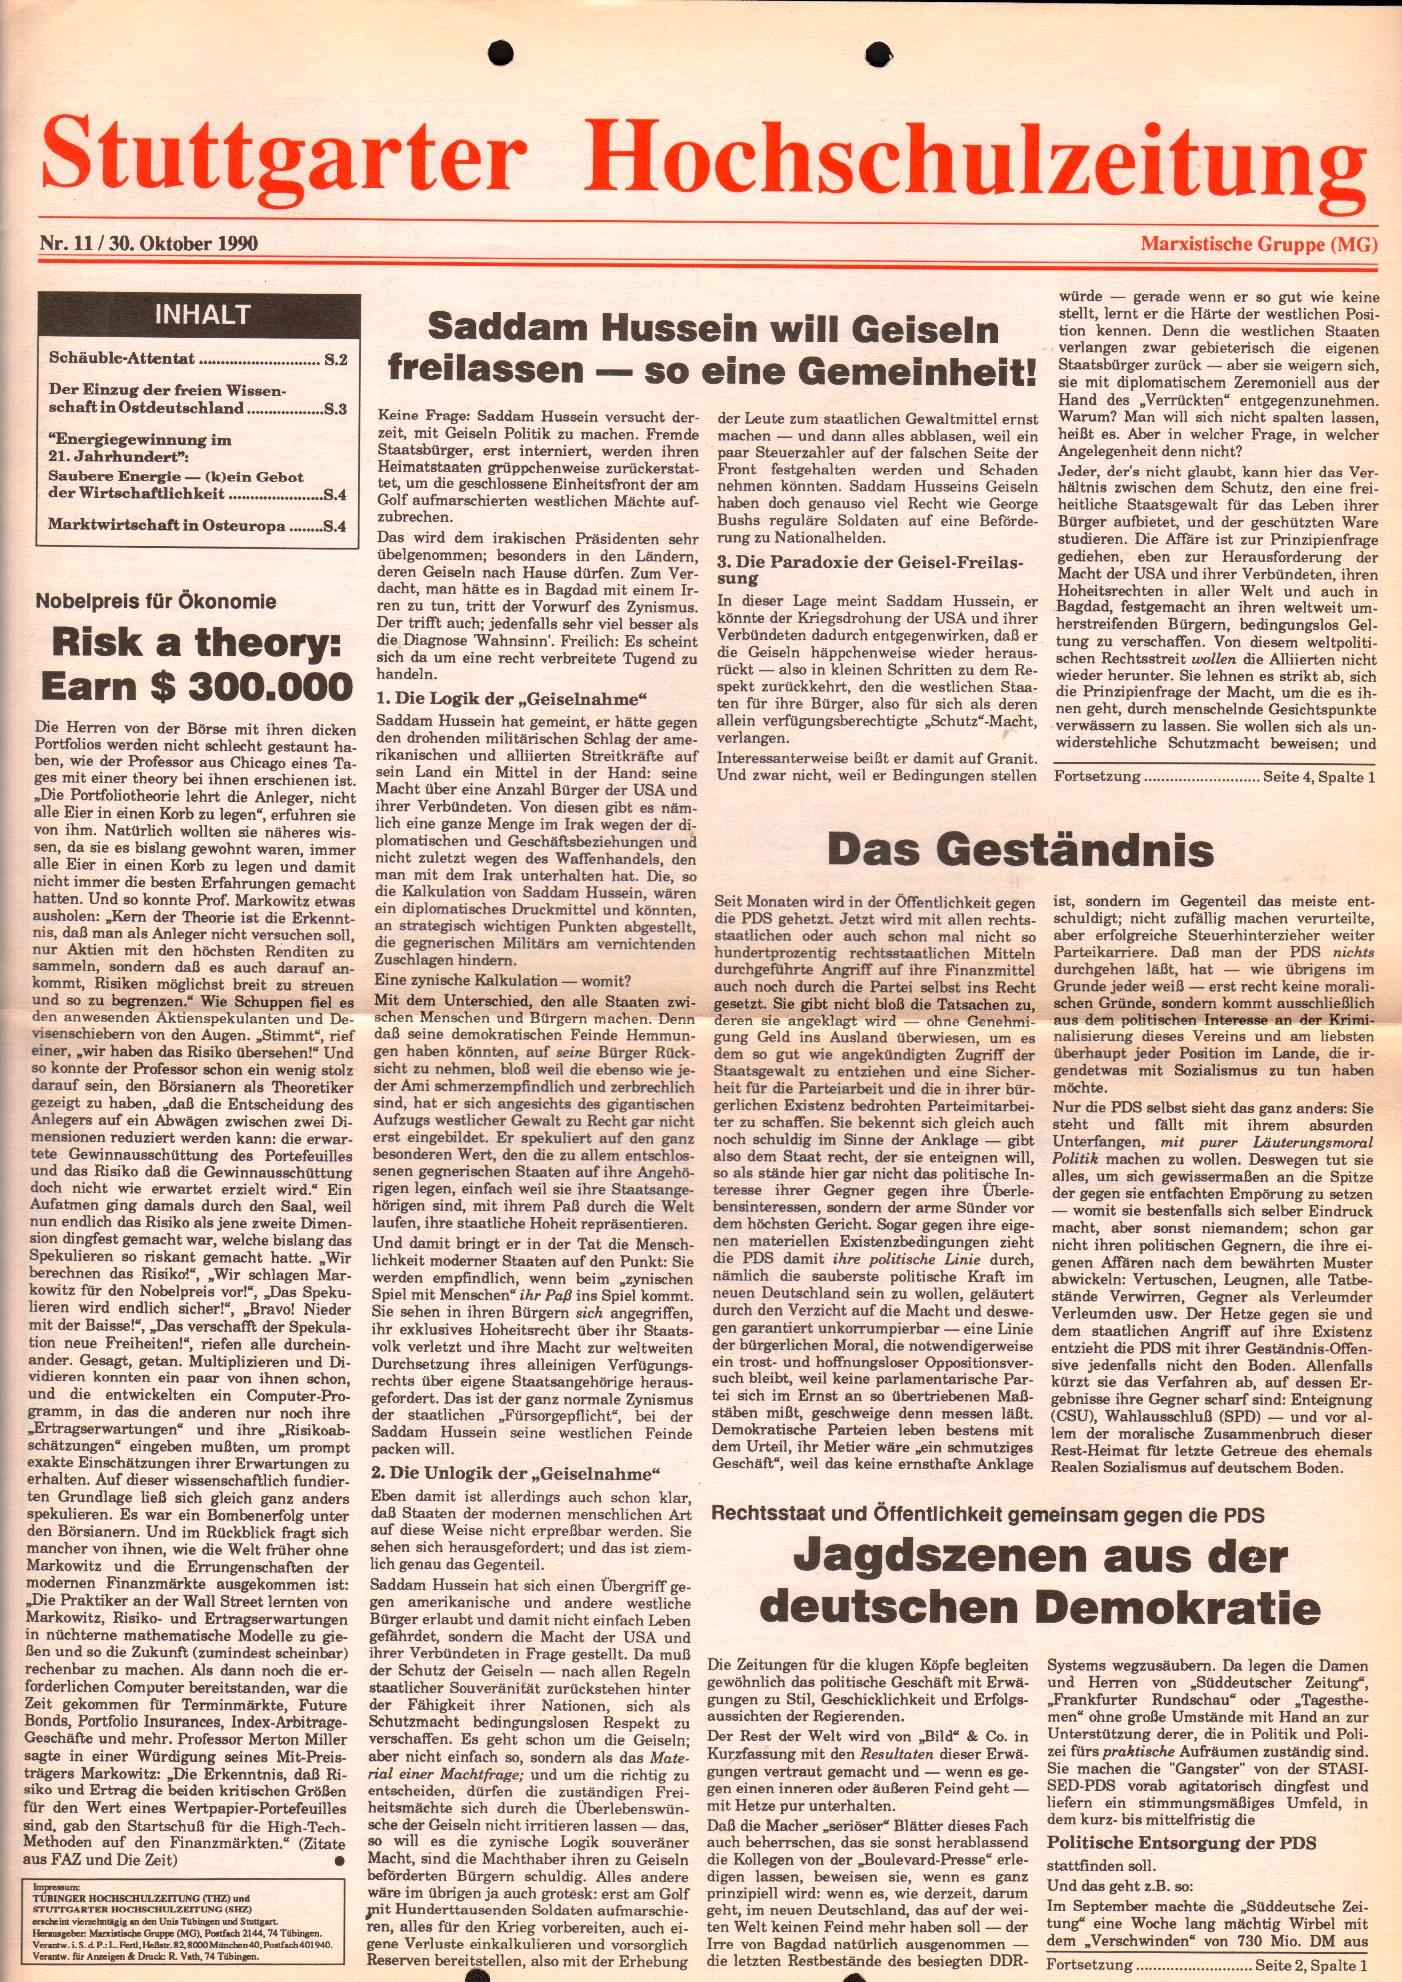 Stuttgart_MG_Hochschulzeitung_1990_11_01